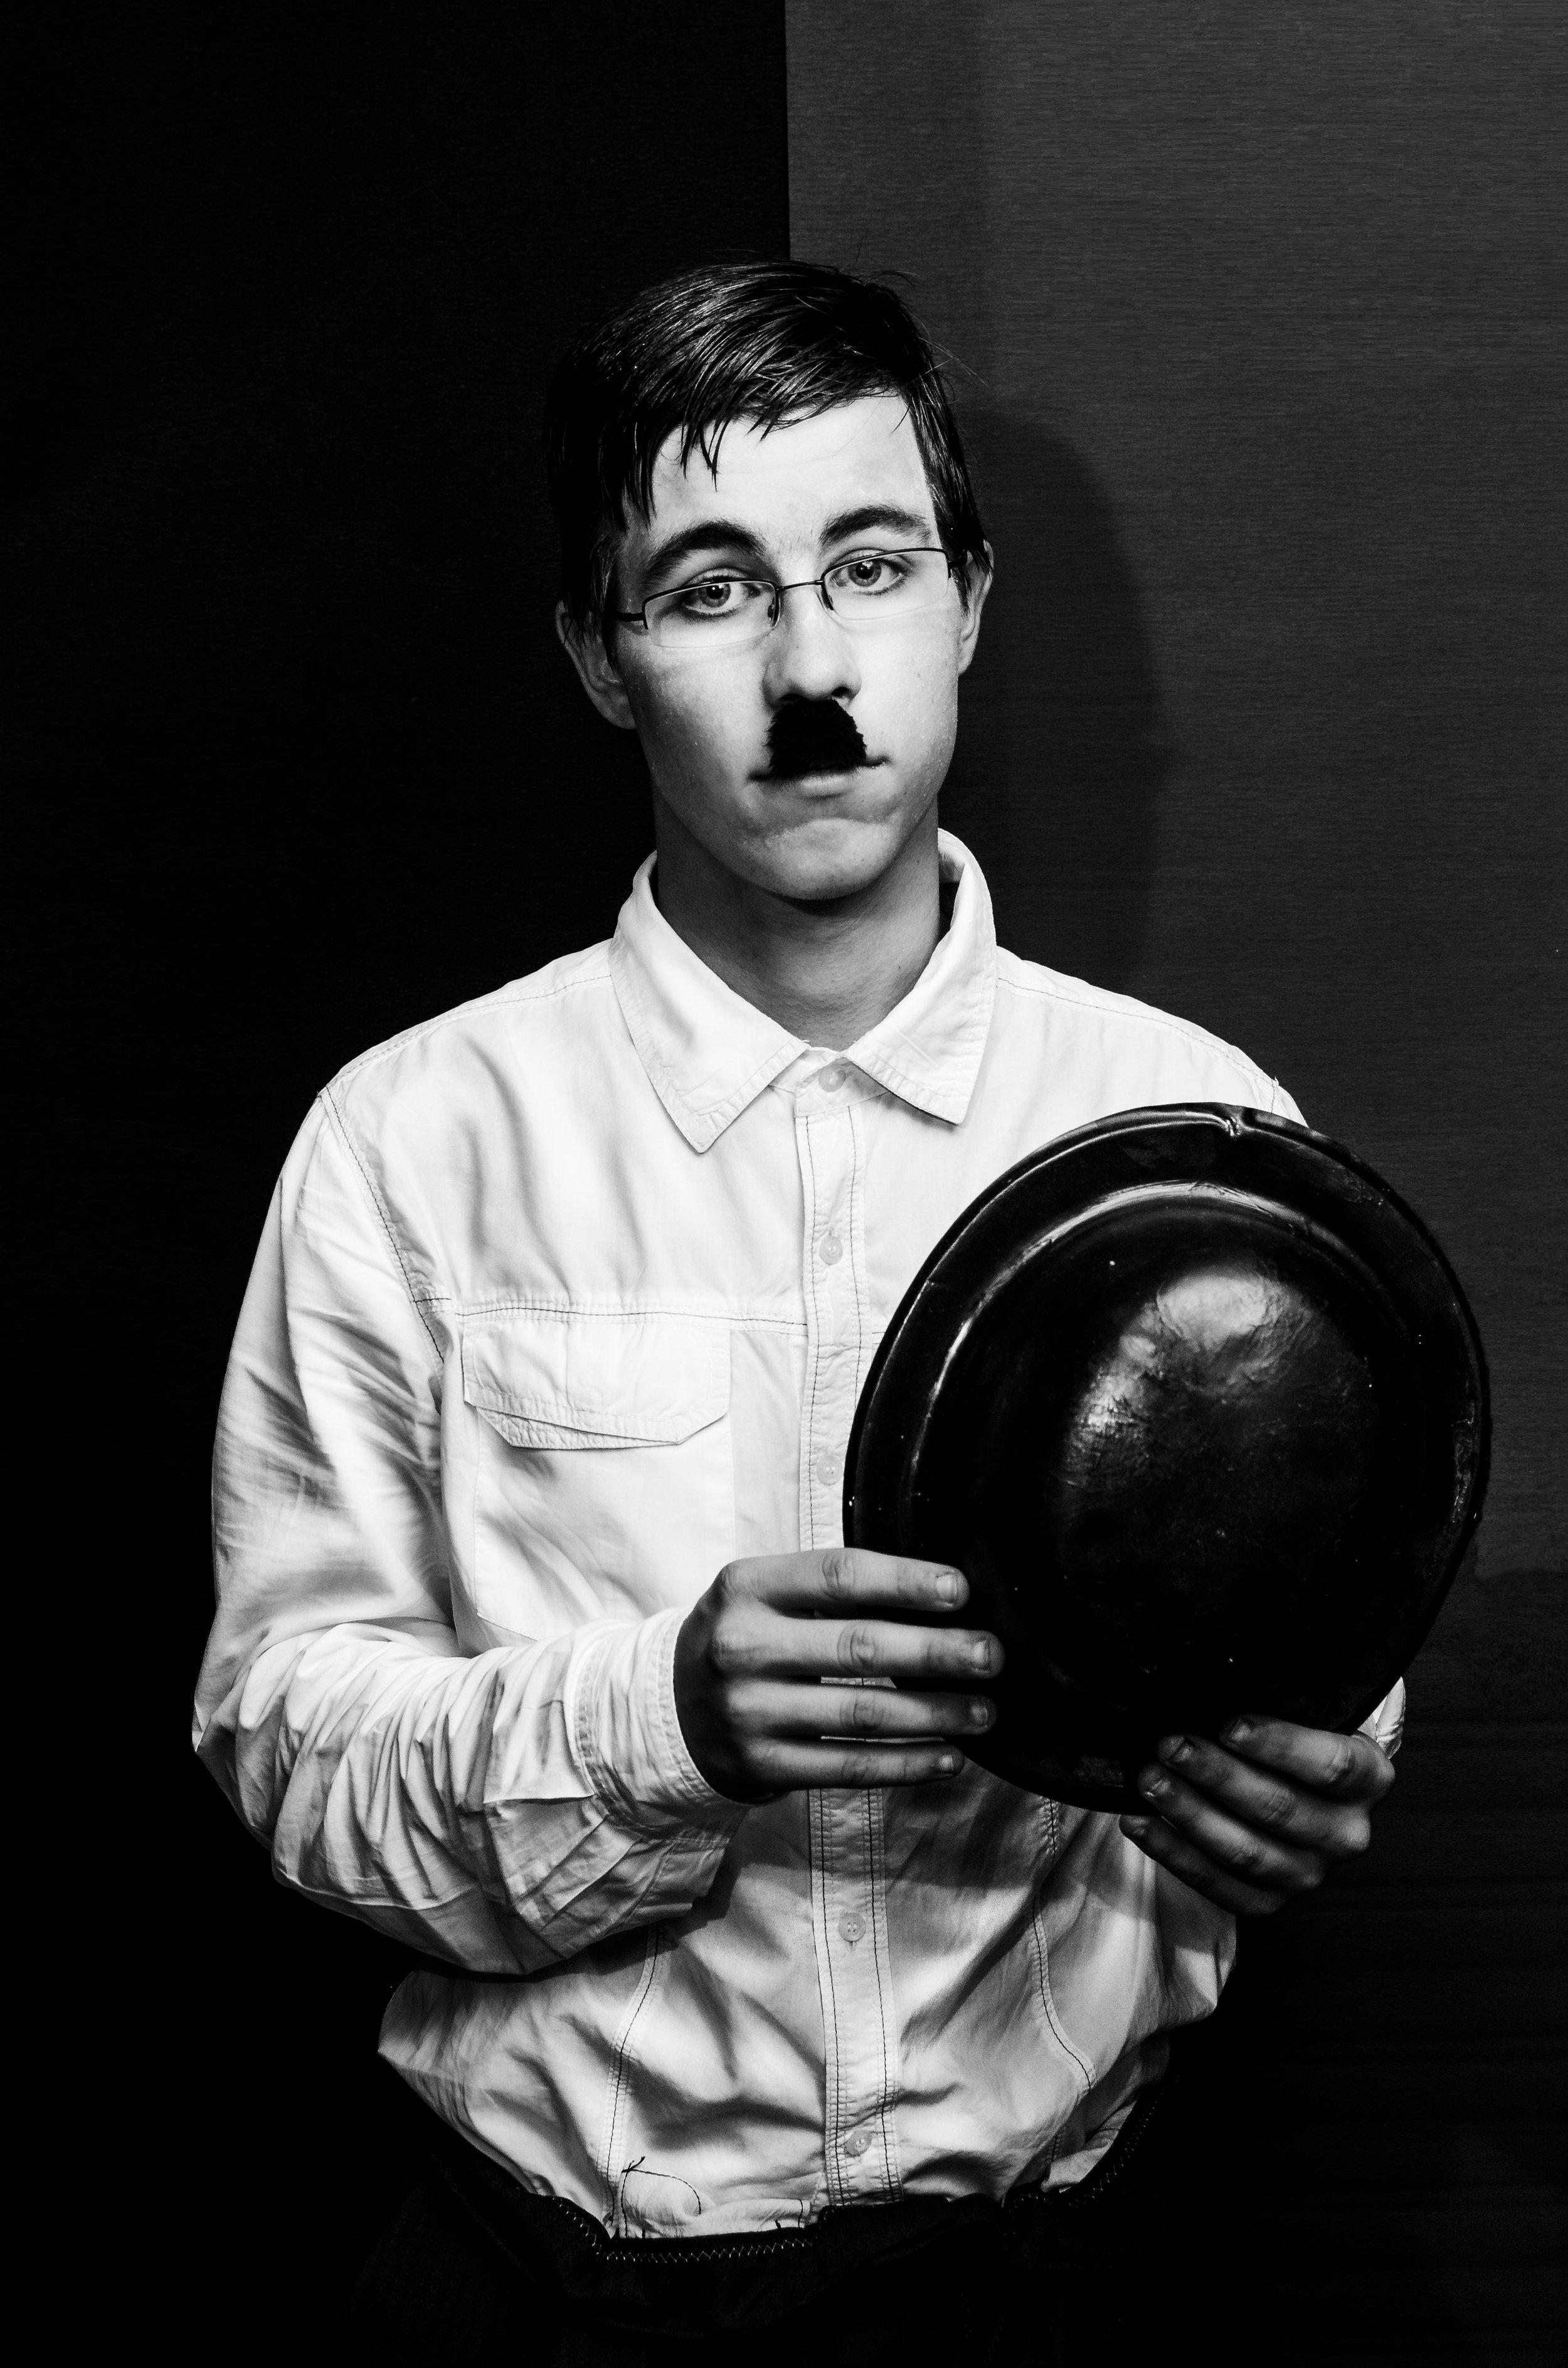 Konstantin Karchev as Charlie Chaplin